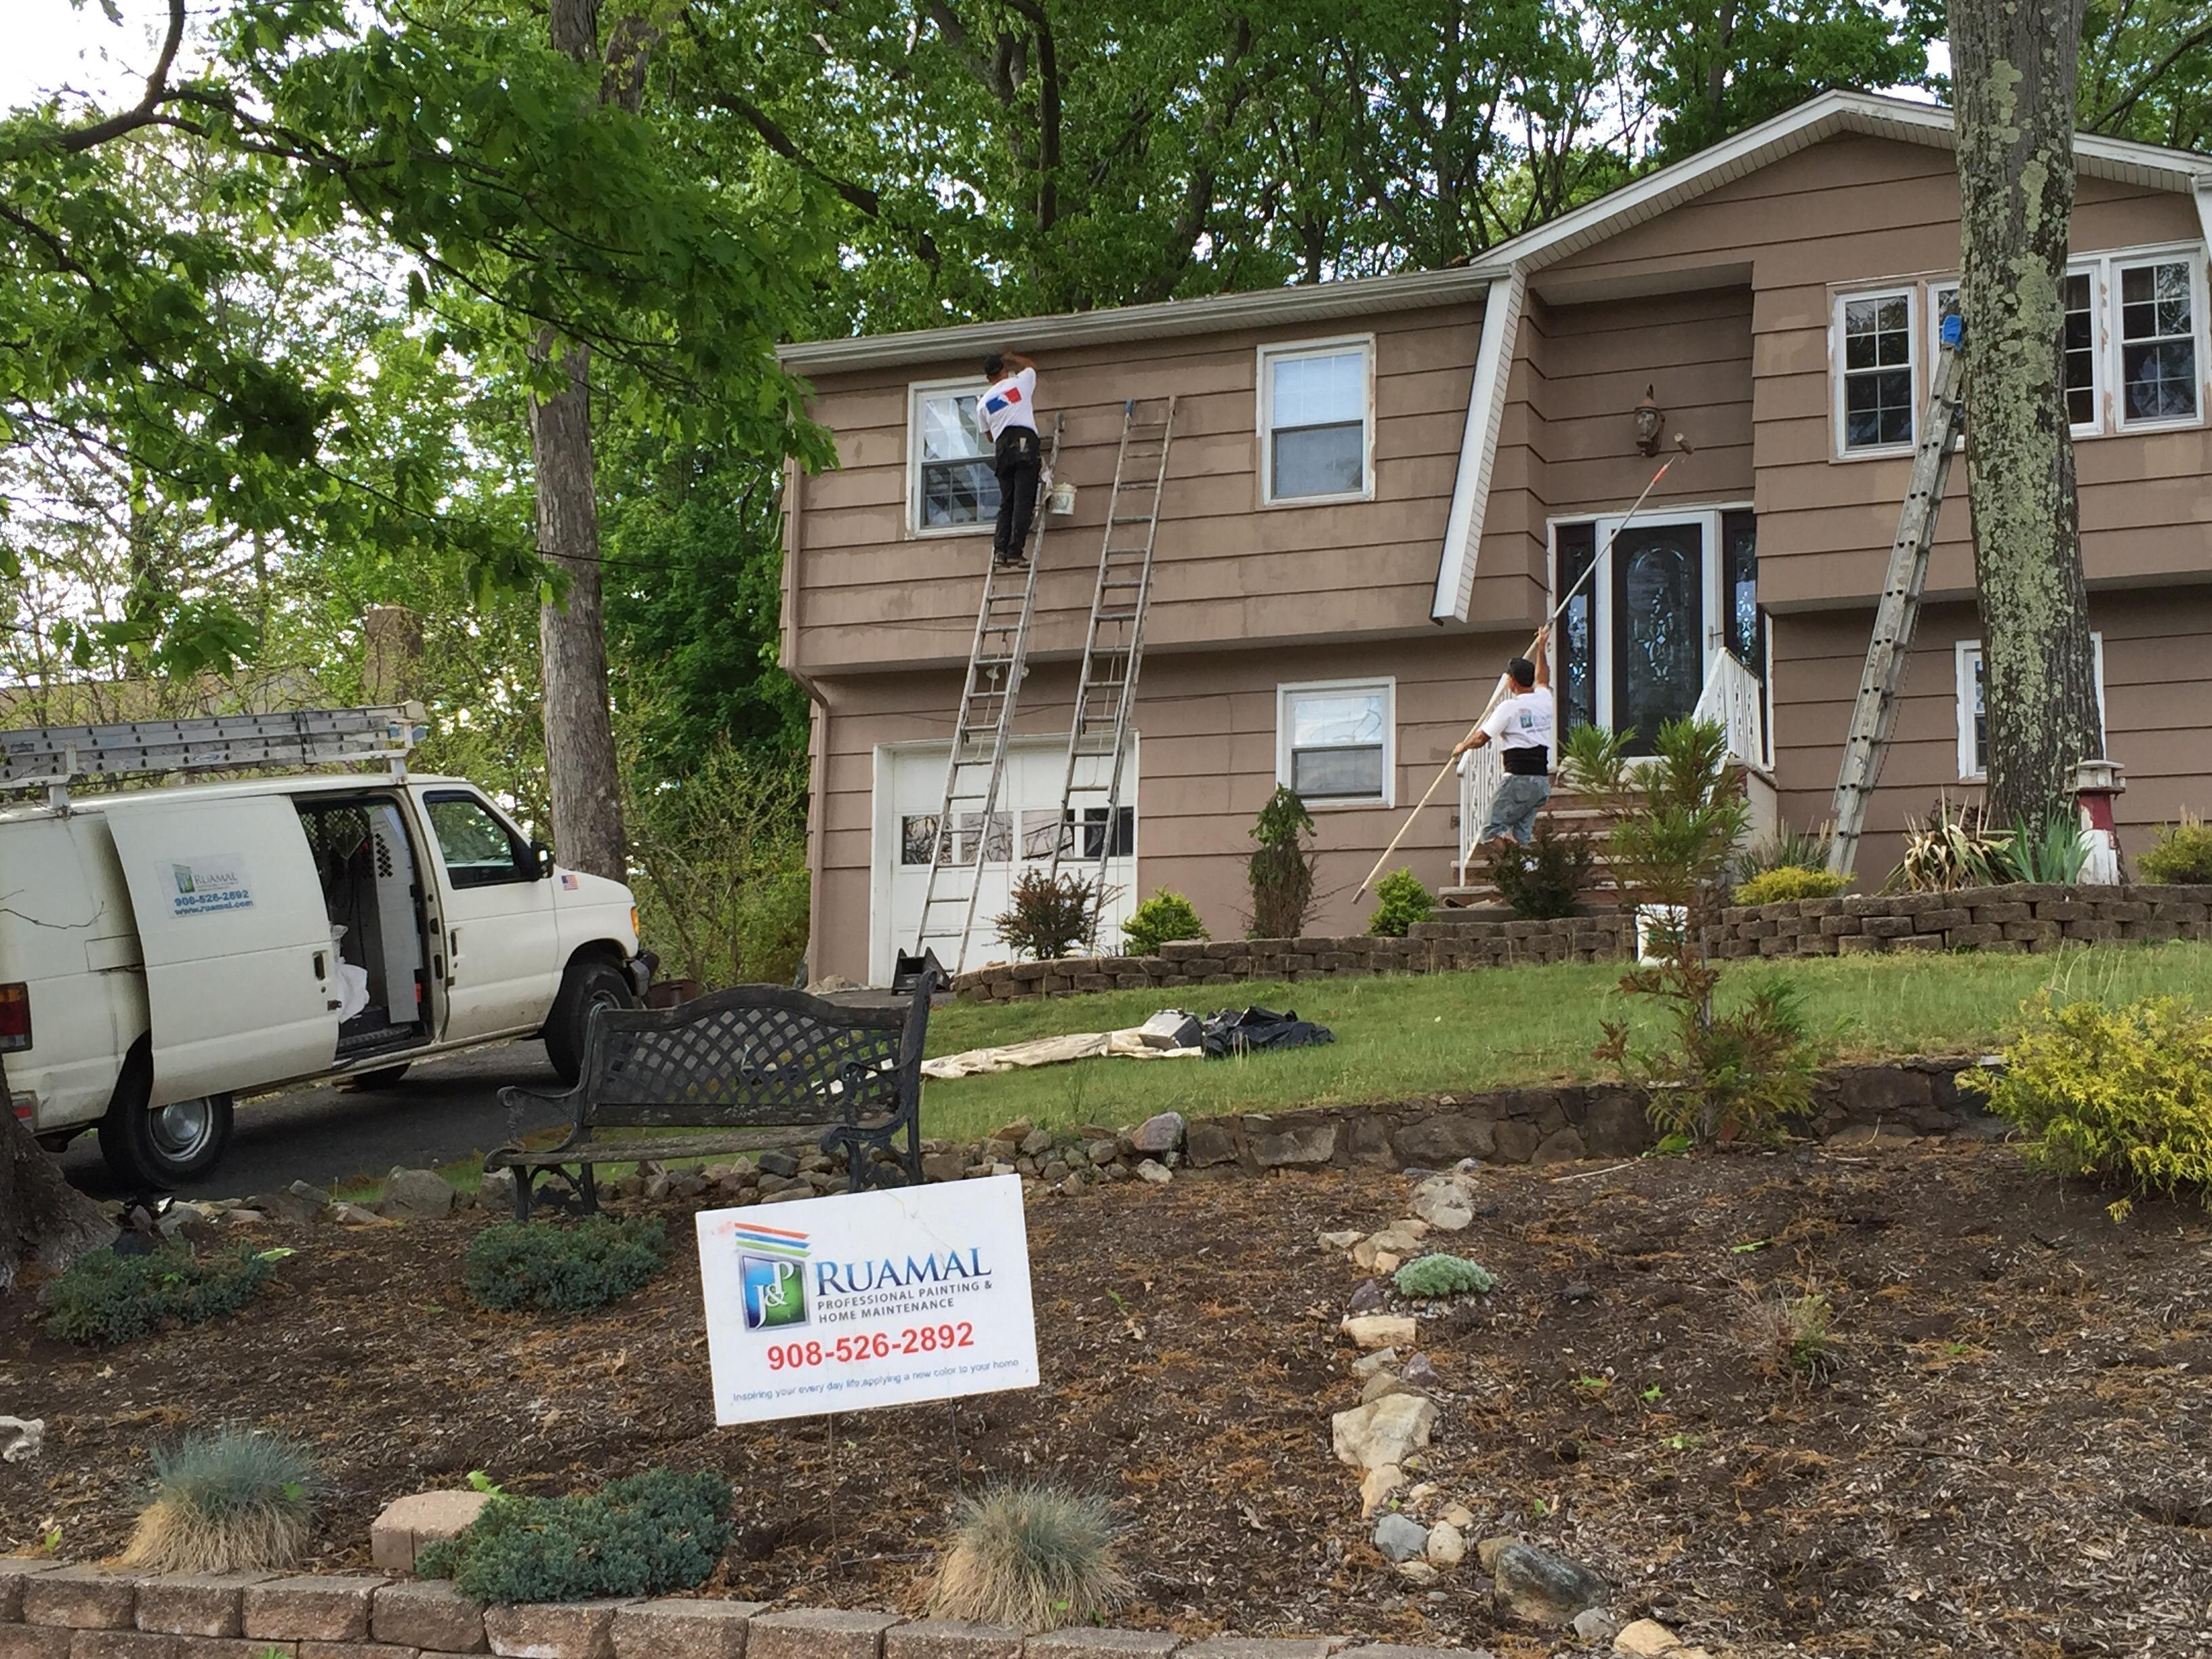 Ruamal Painting And Home Maintenance LLC image 0